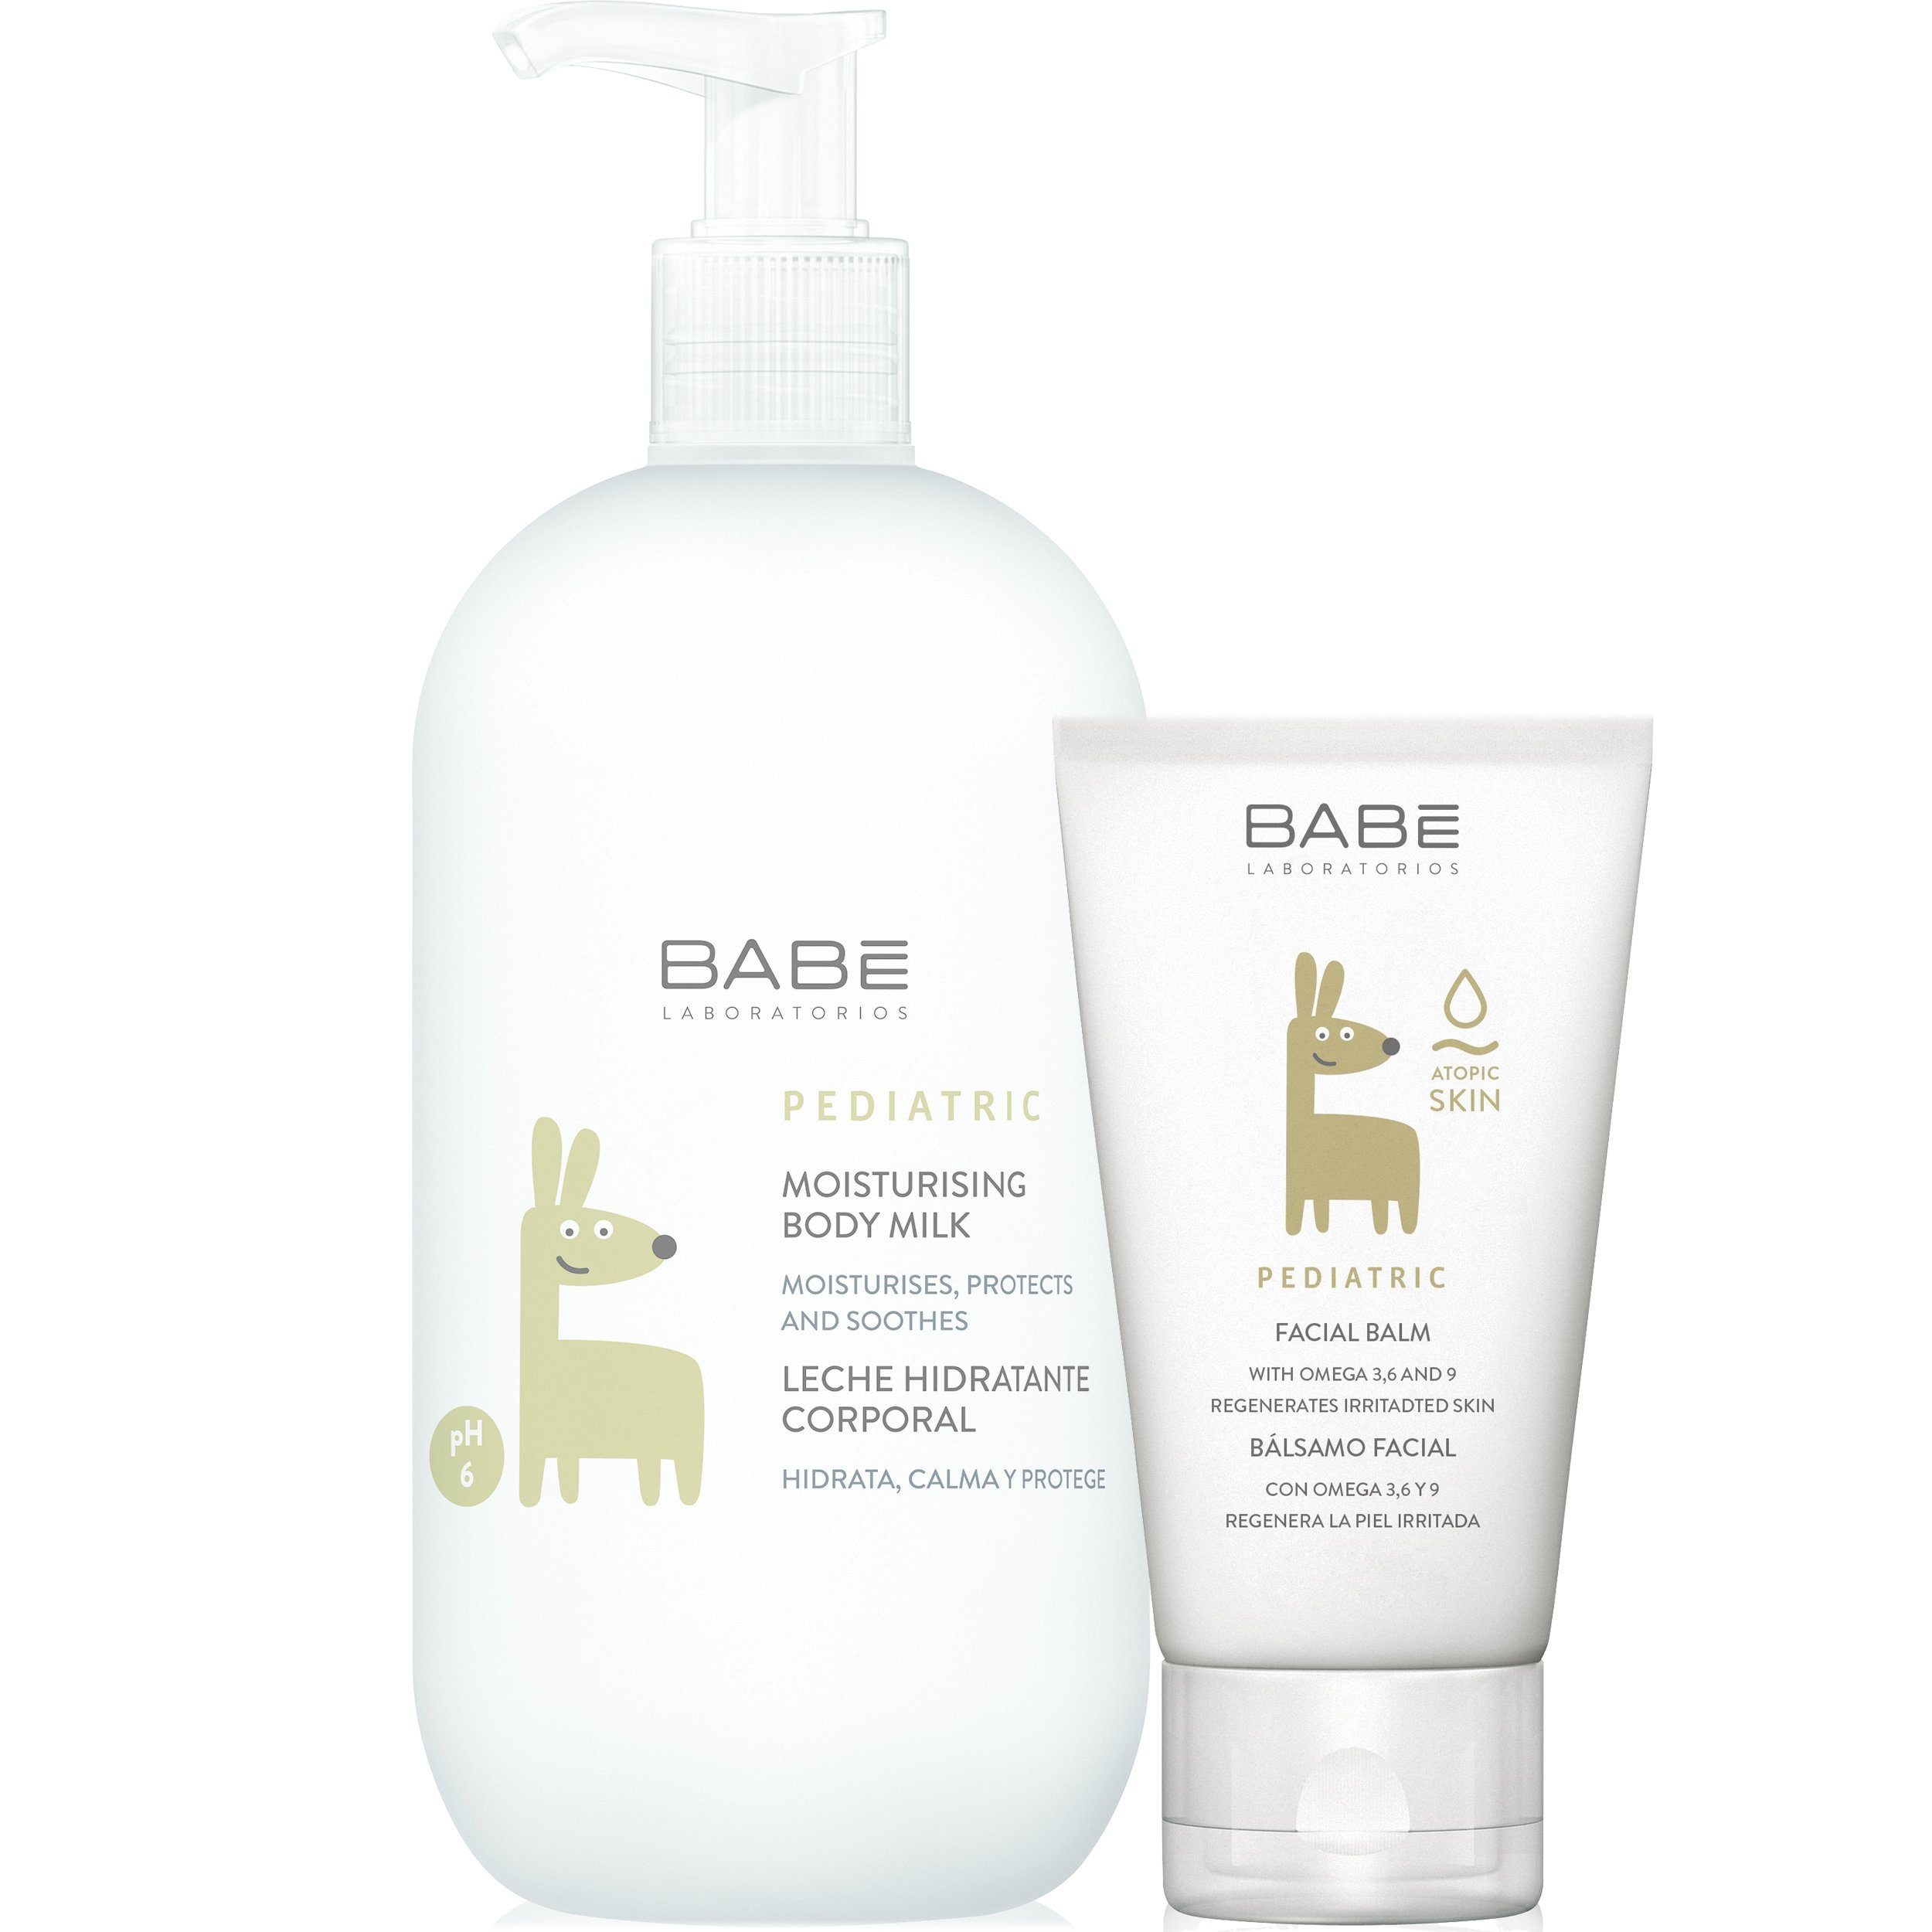 Babe Πακέτο Προσφοράς Pediatric Moisturizing Body Milk 500ml & Δώρο Pediatric Facial Balm 50ml